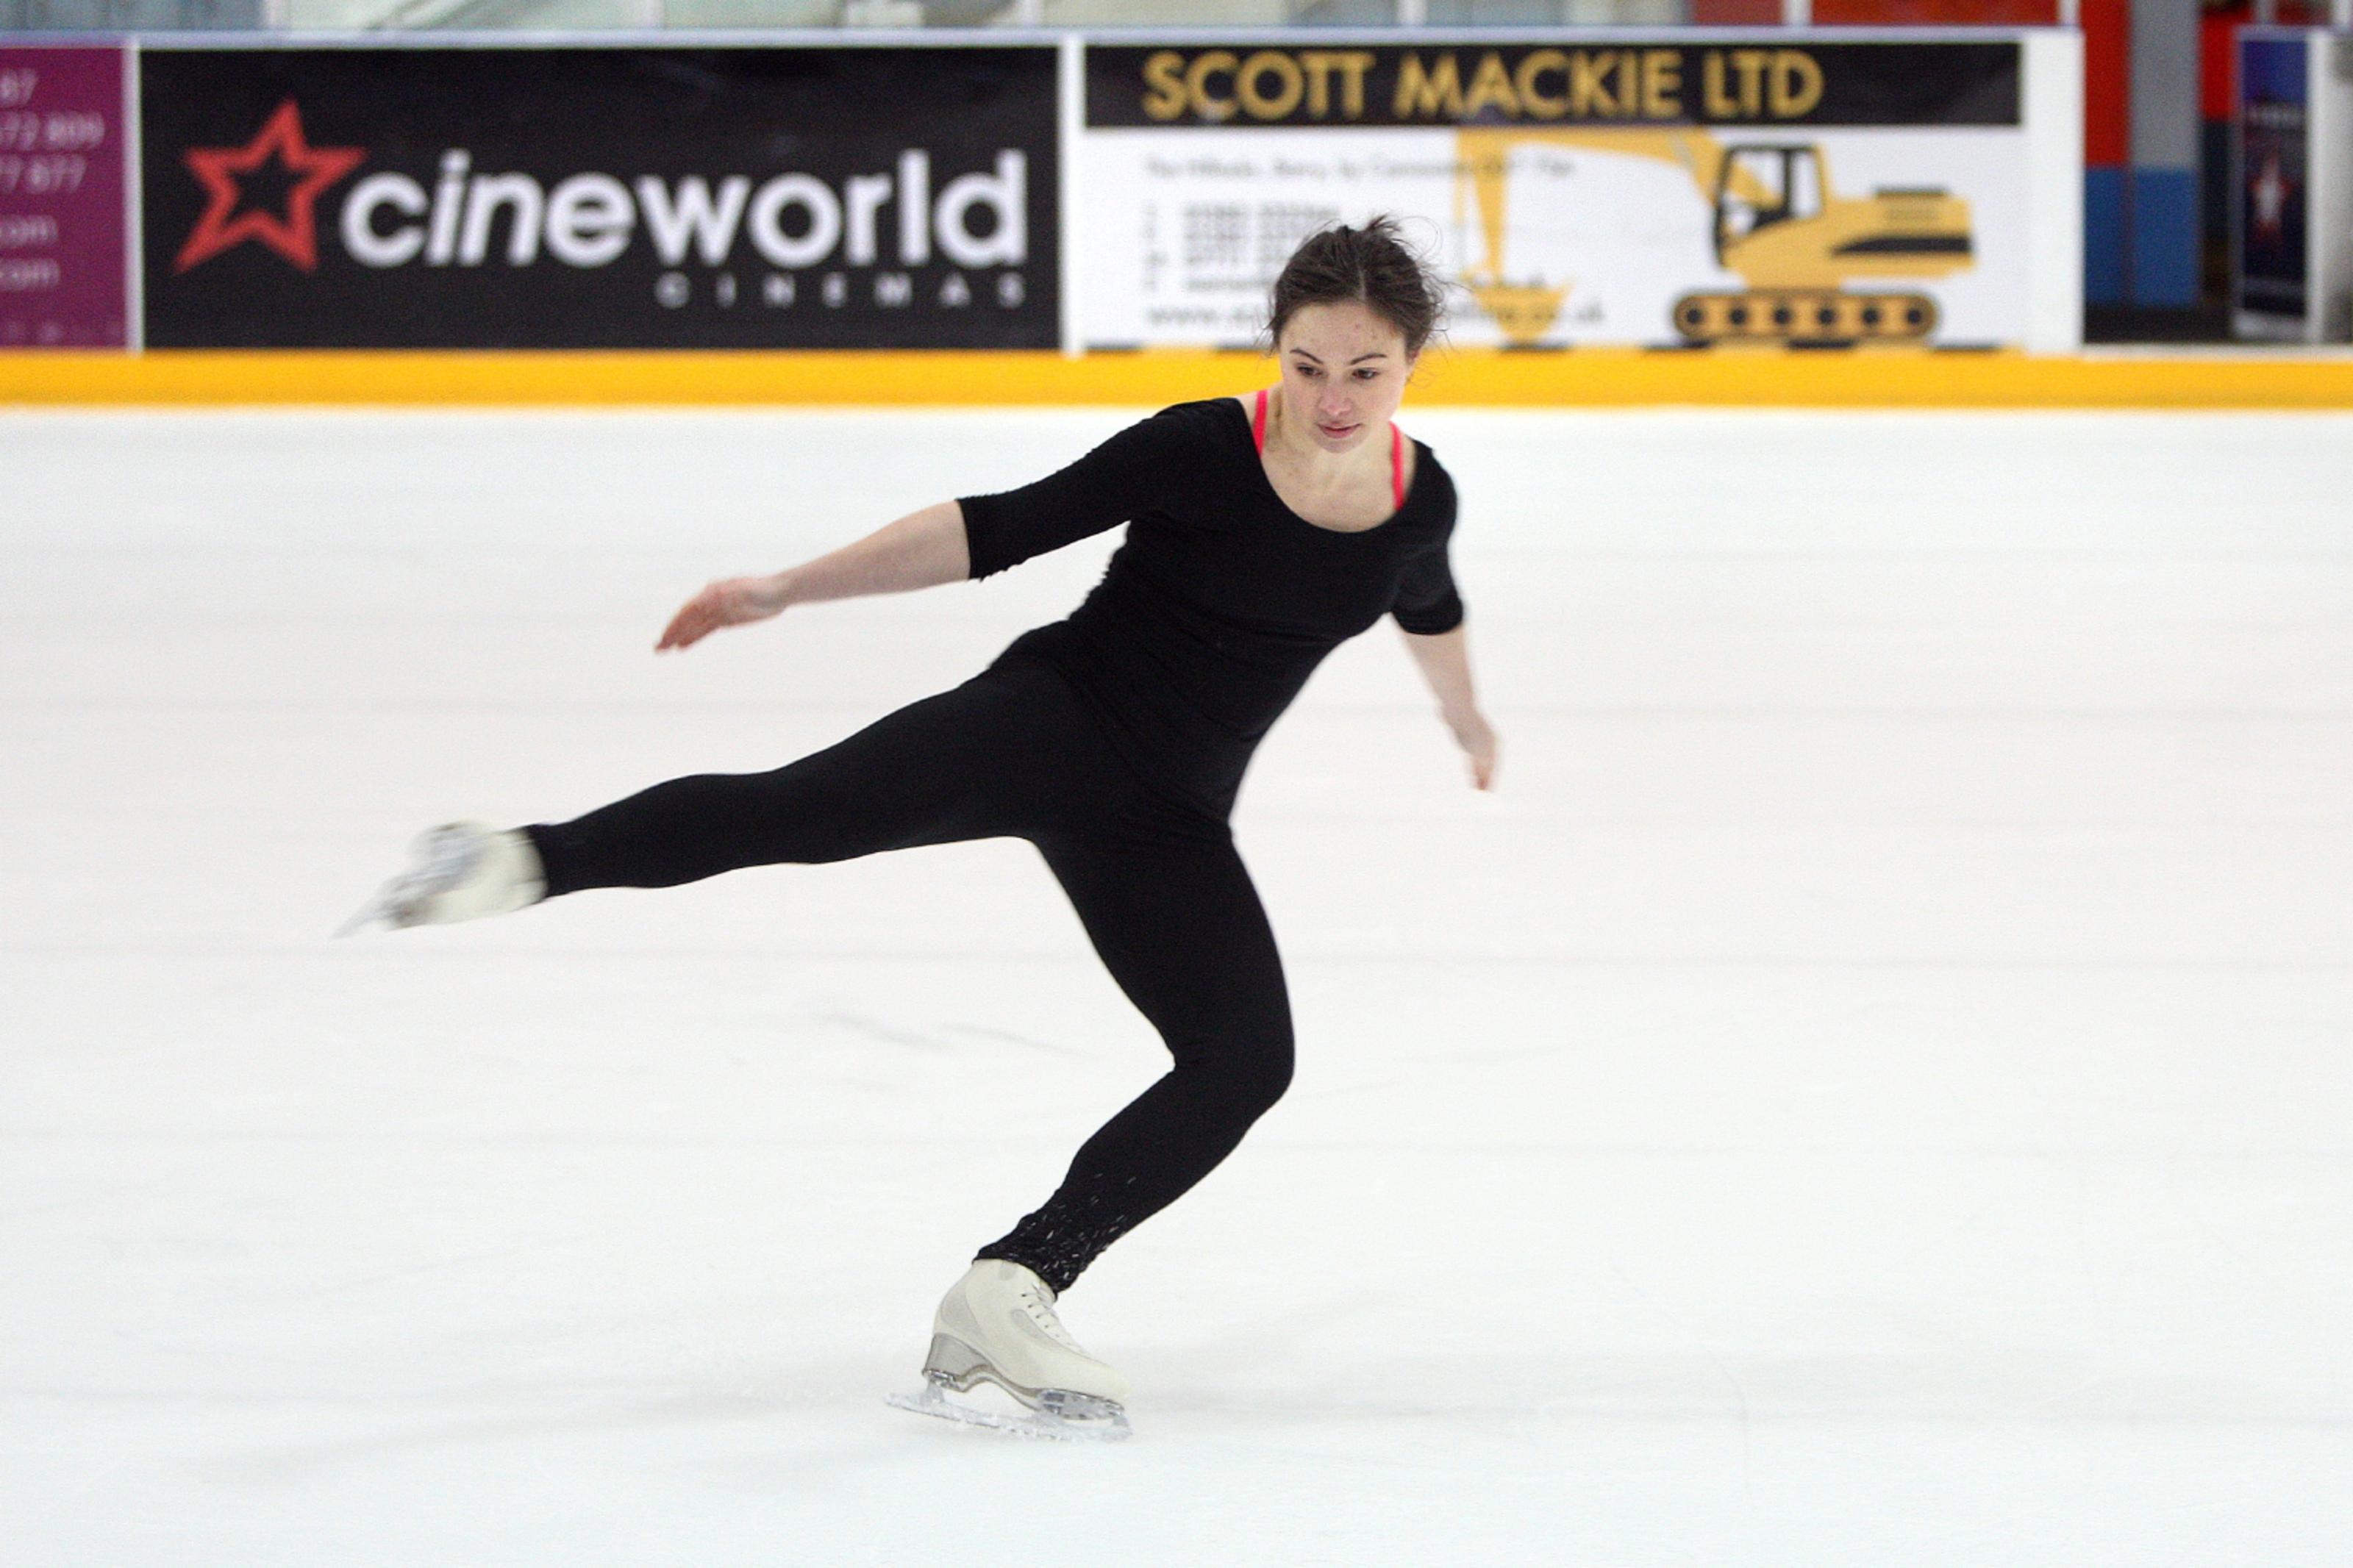 Katie Powell on the ice.